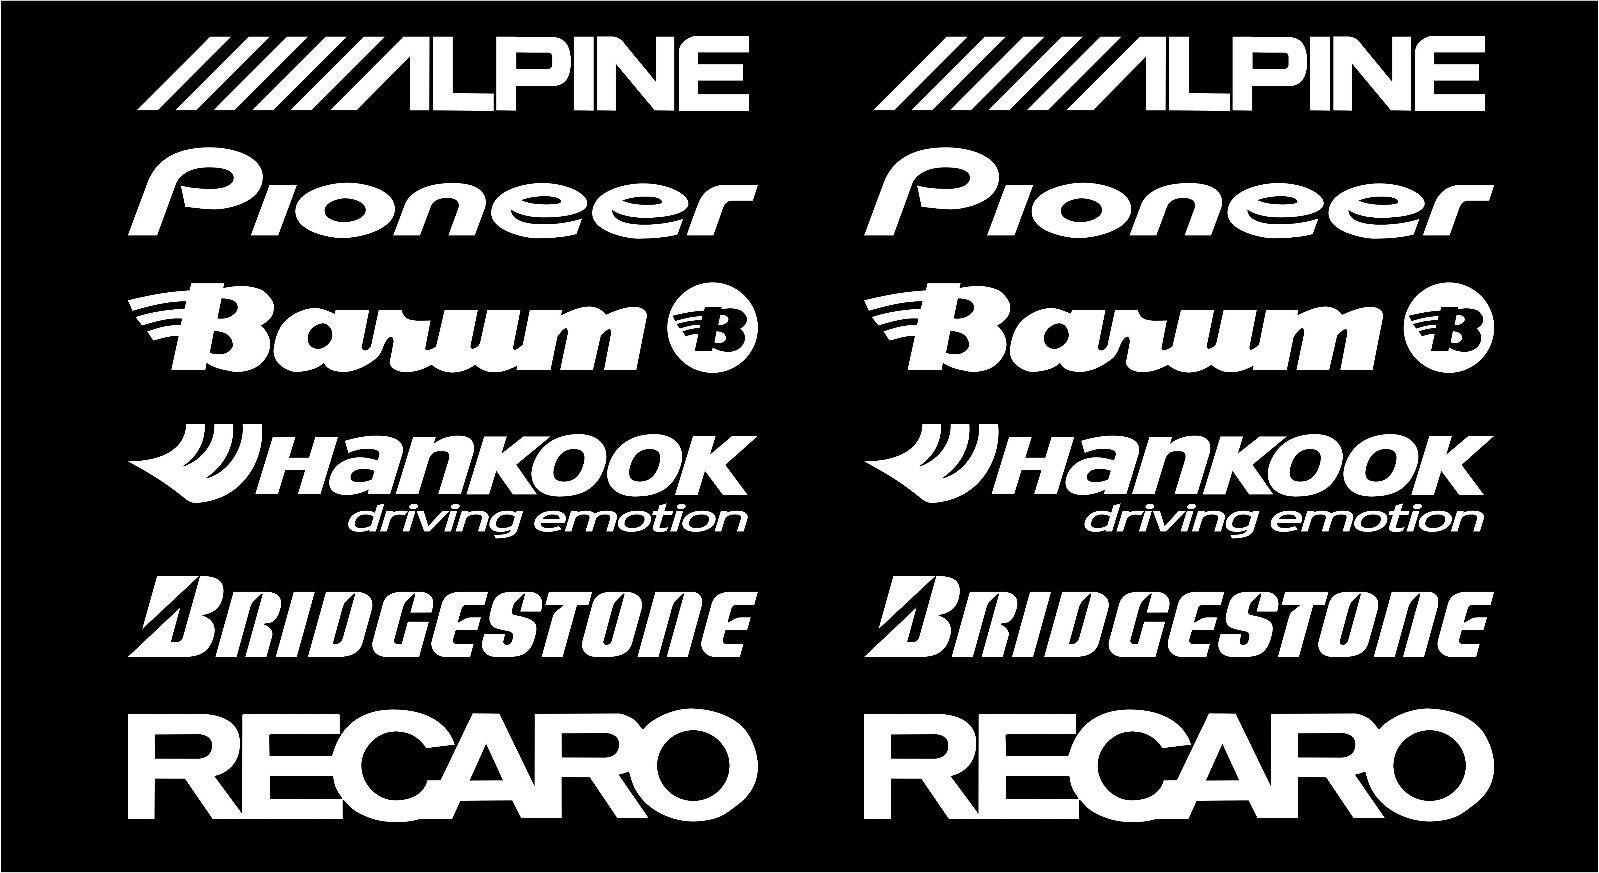 For 1Set ALPINE, PIONEER, BARUM, HANKOOK, BRIDGESTONE, RECARO car stickers WHITE #SK-004 Car Styling